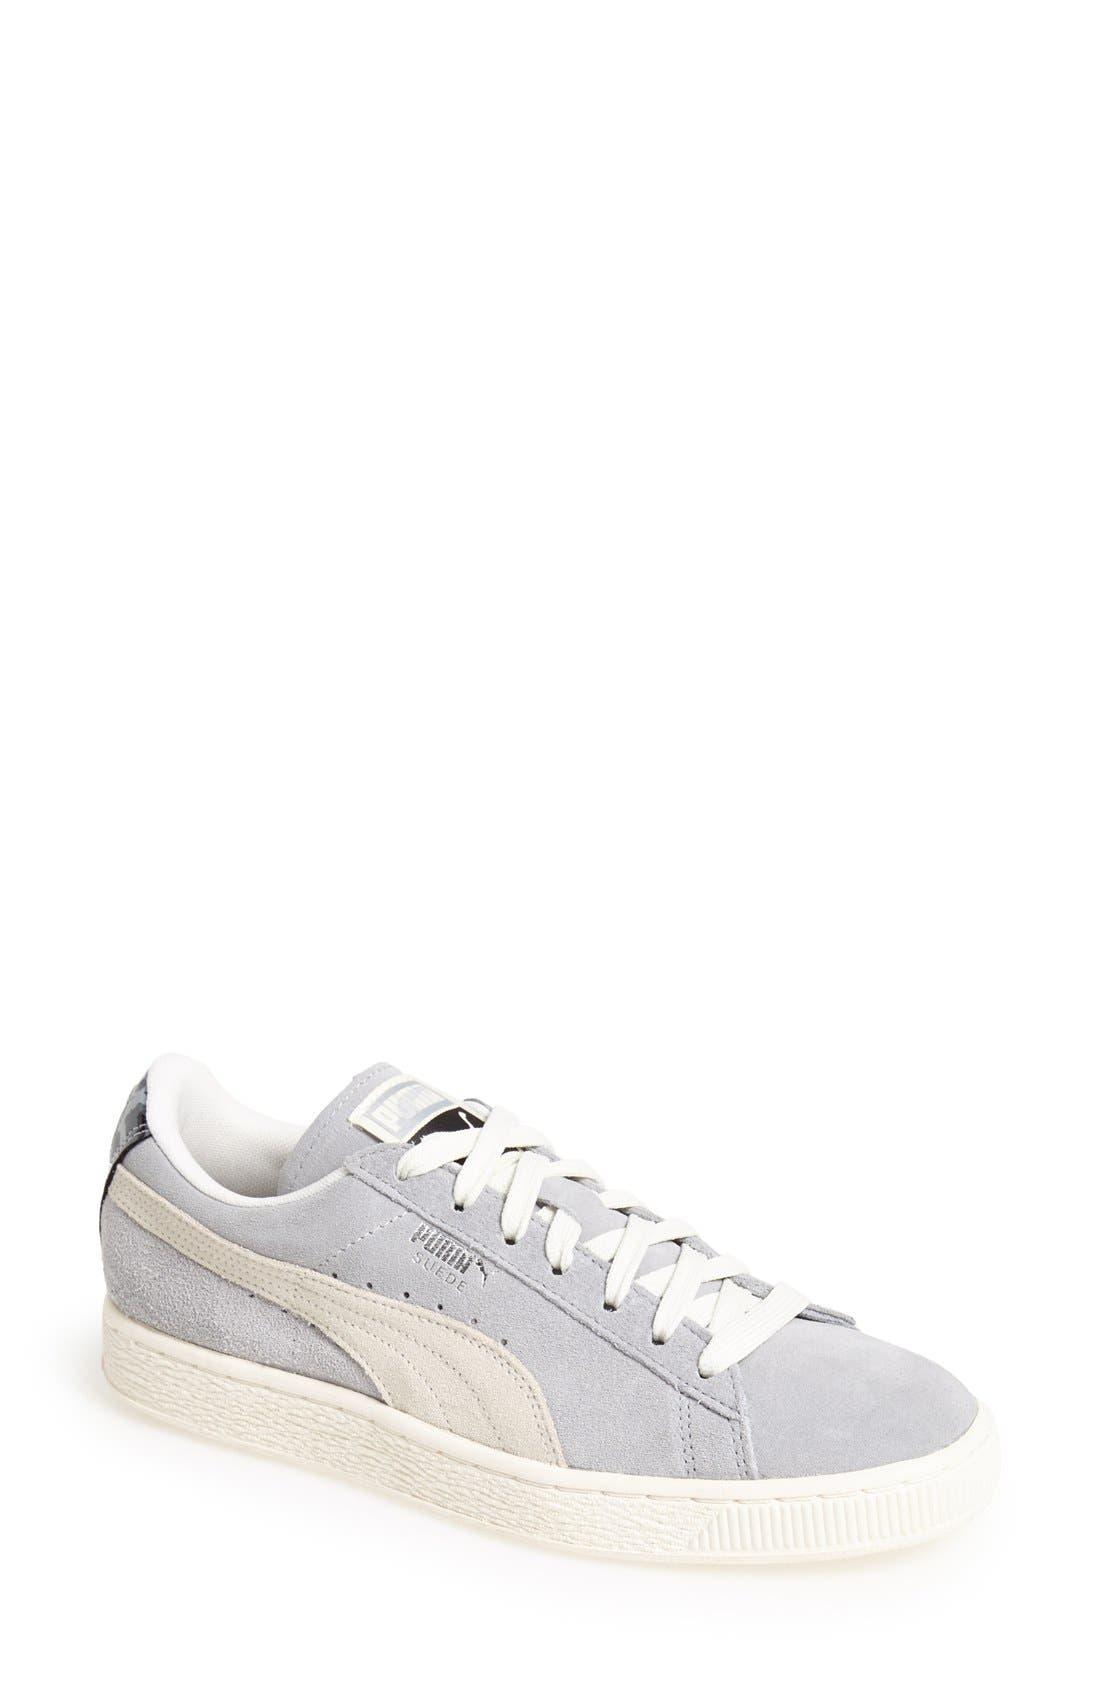 Alternate Image 1 Selected - PUMA 'Classic' Suede Sneaker (Women)